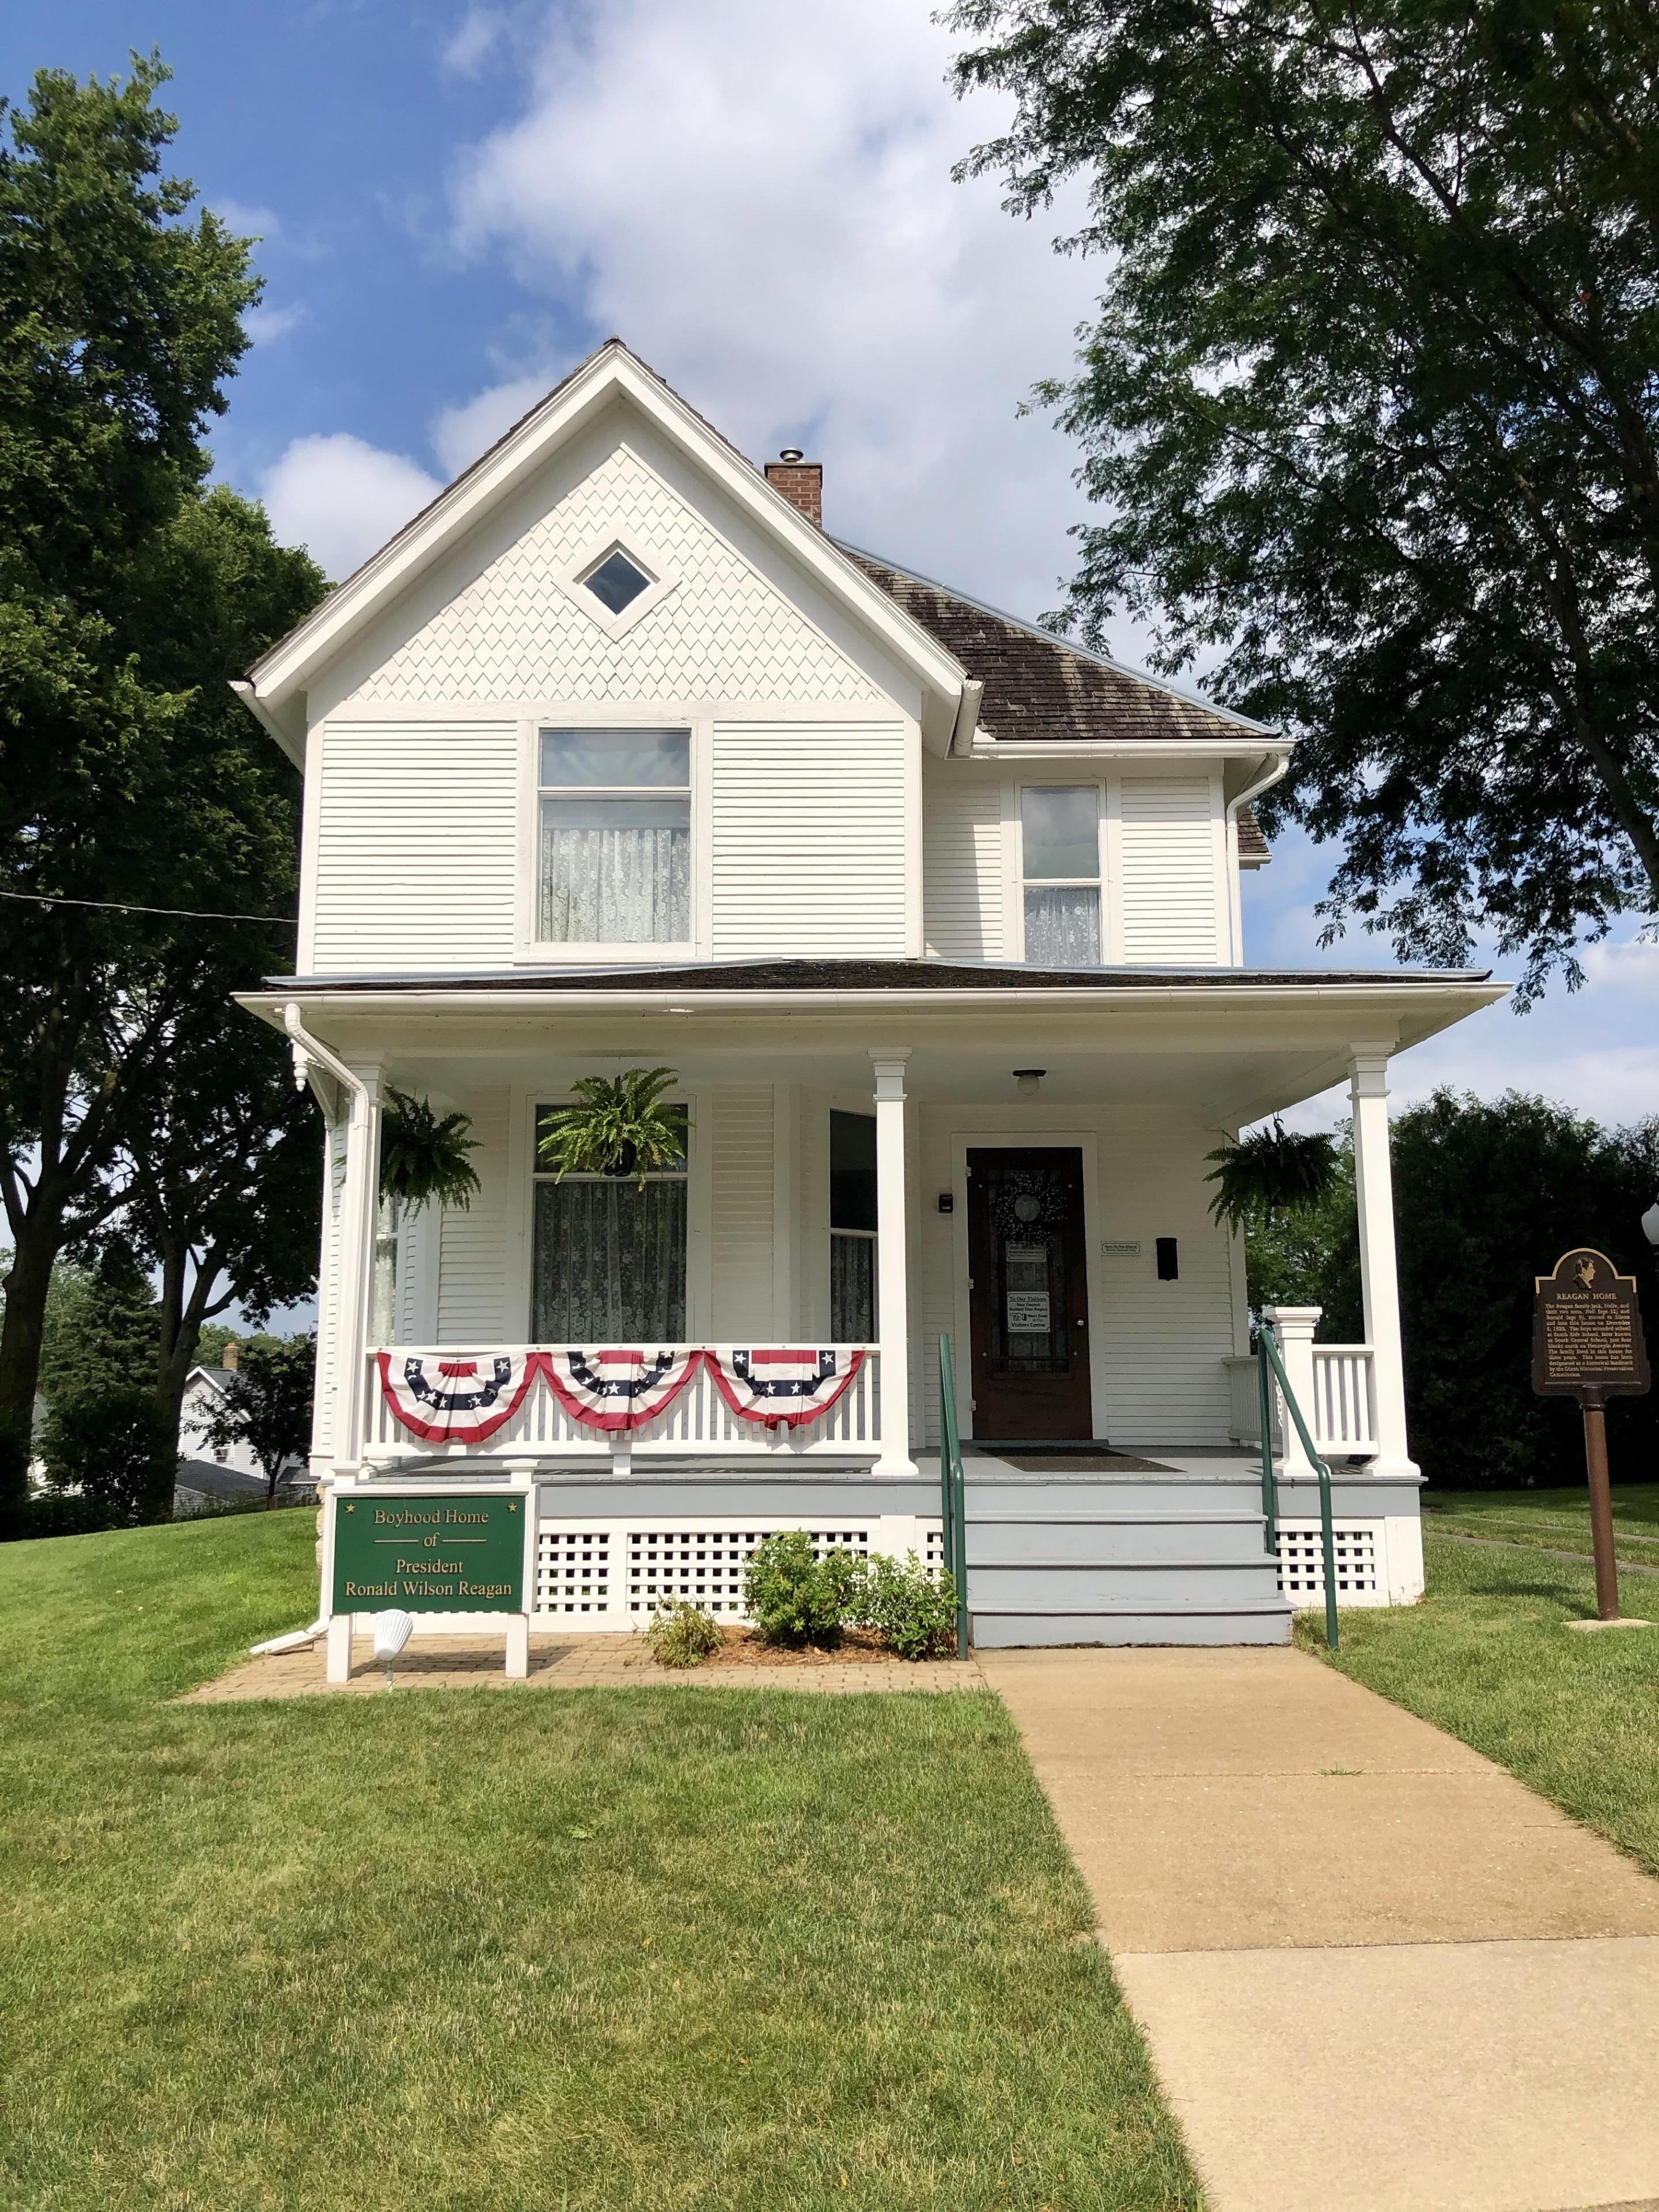 Lee County, Illinois, United States of America